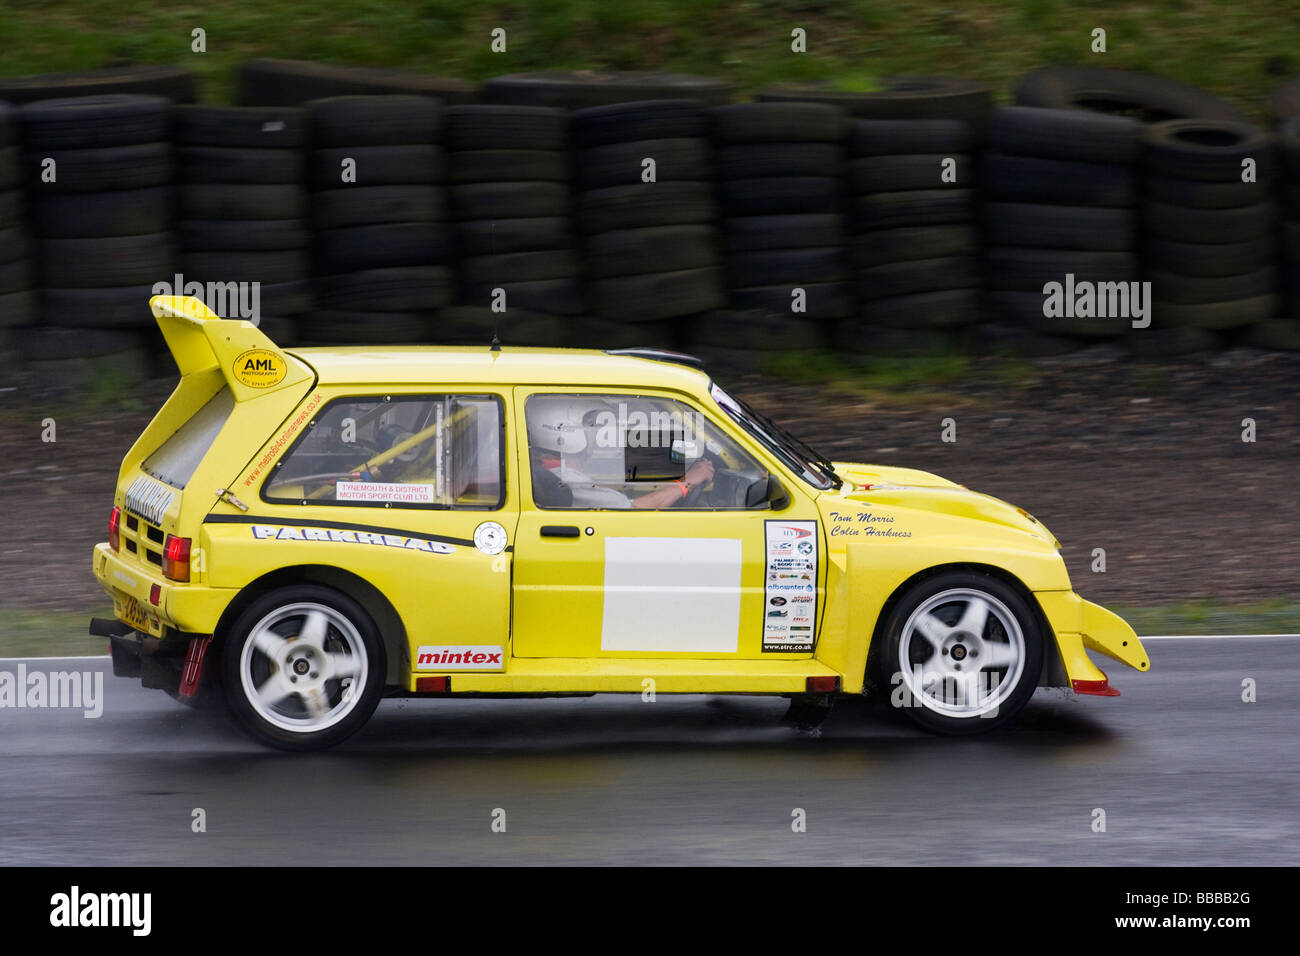 Yellow Metro 6R4 rally car on wet track Stock Photo: 24221752 - Alamy